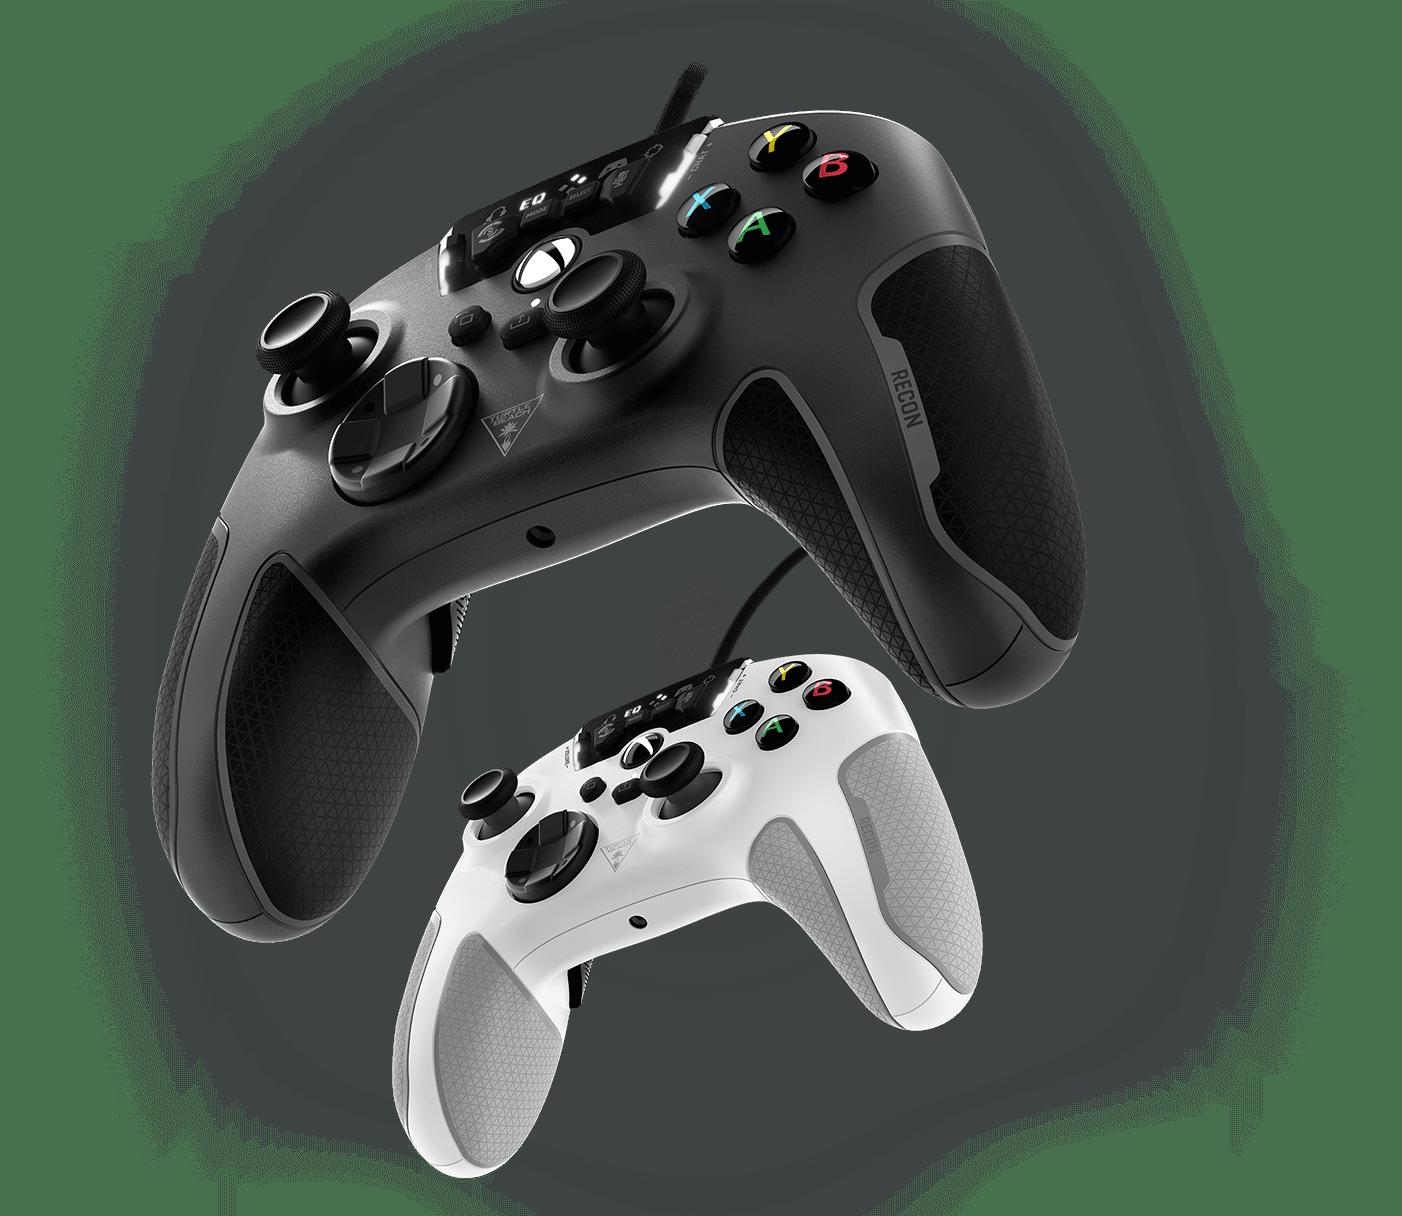 recon controller black & white